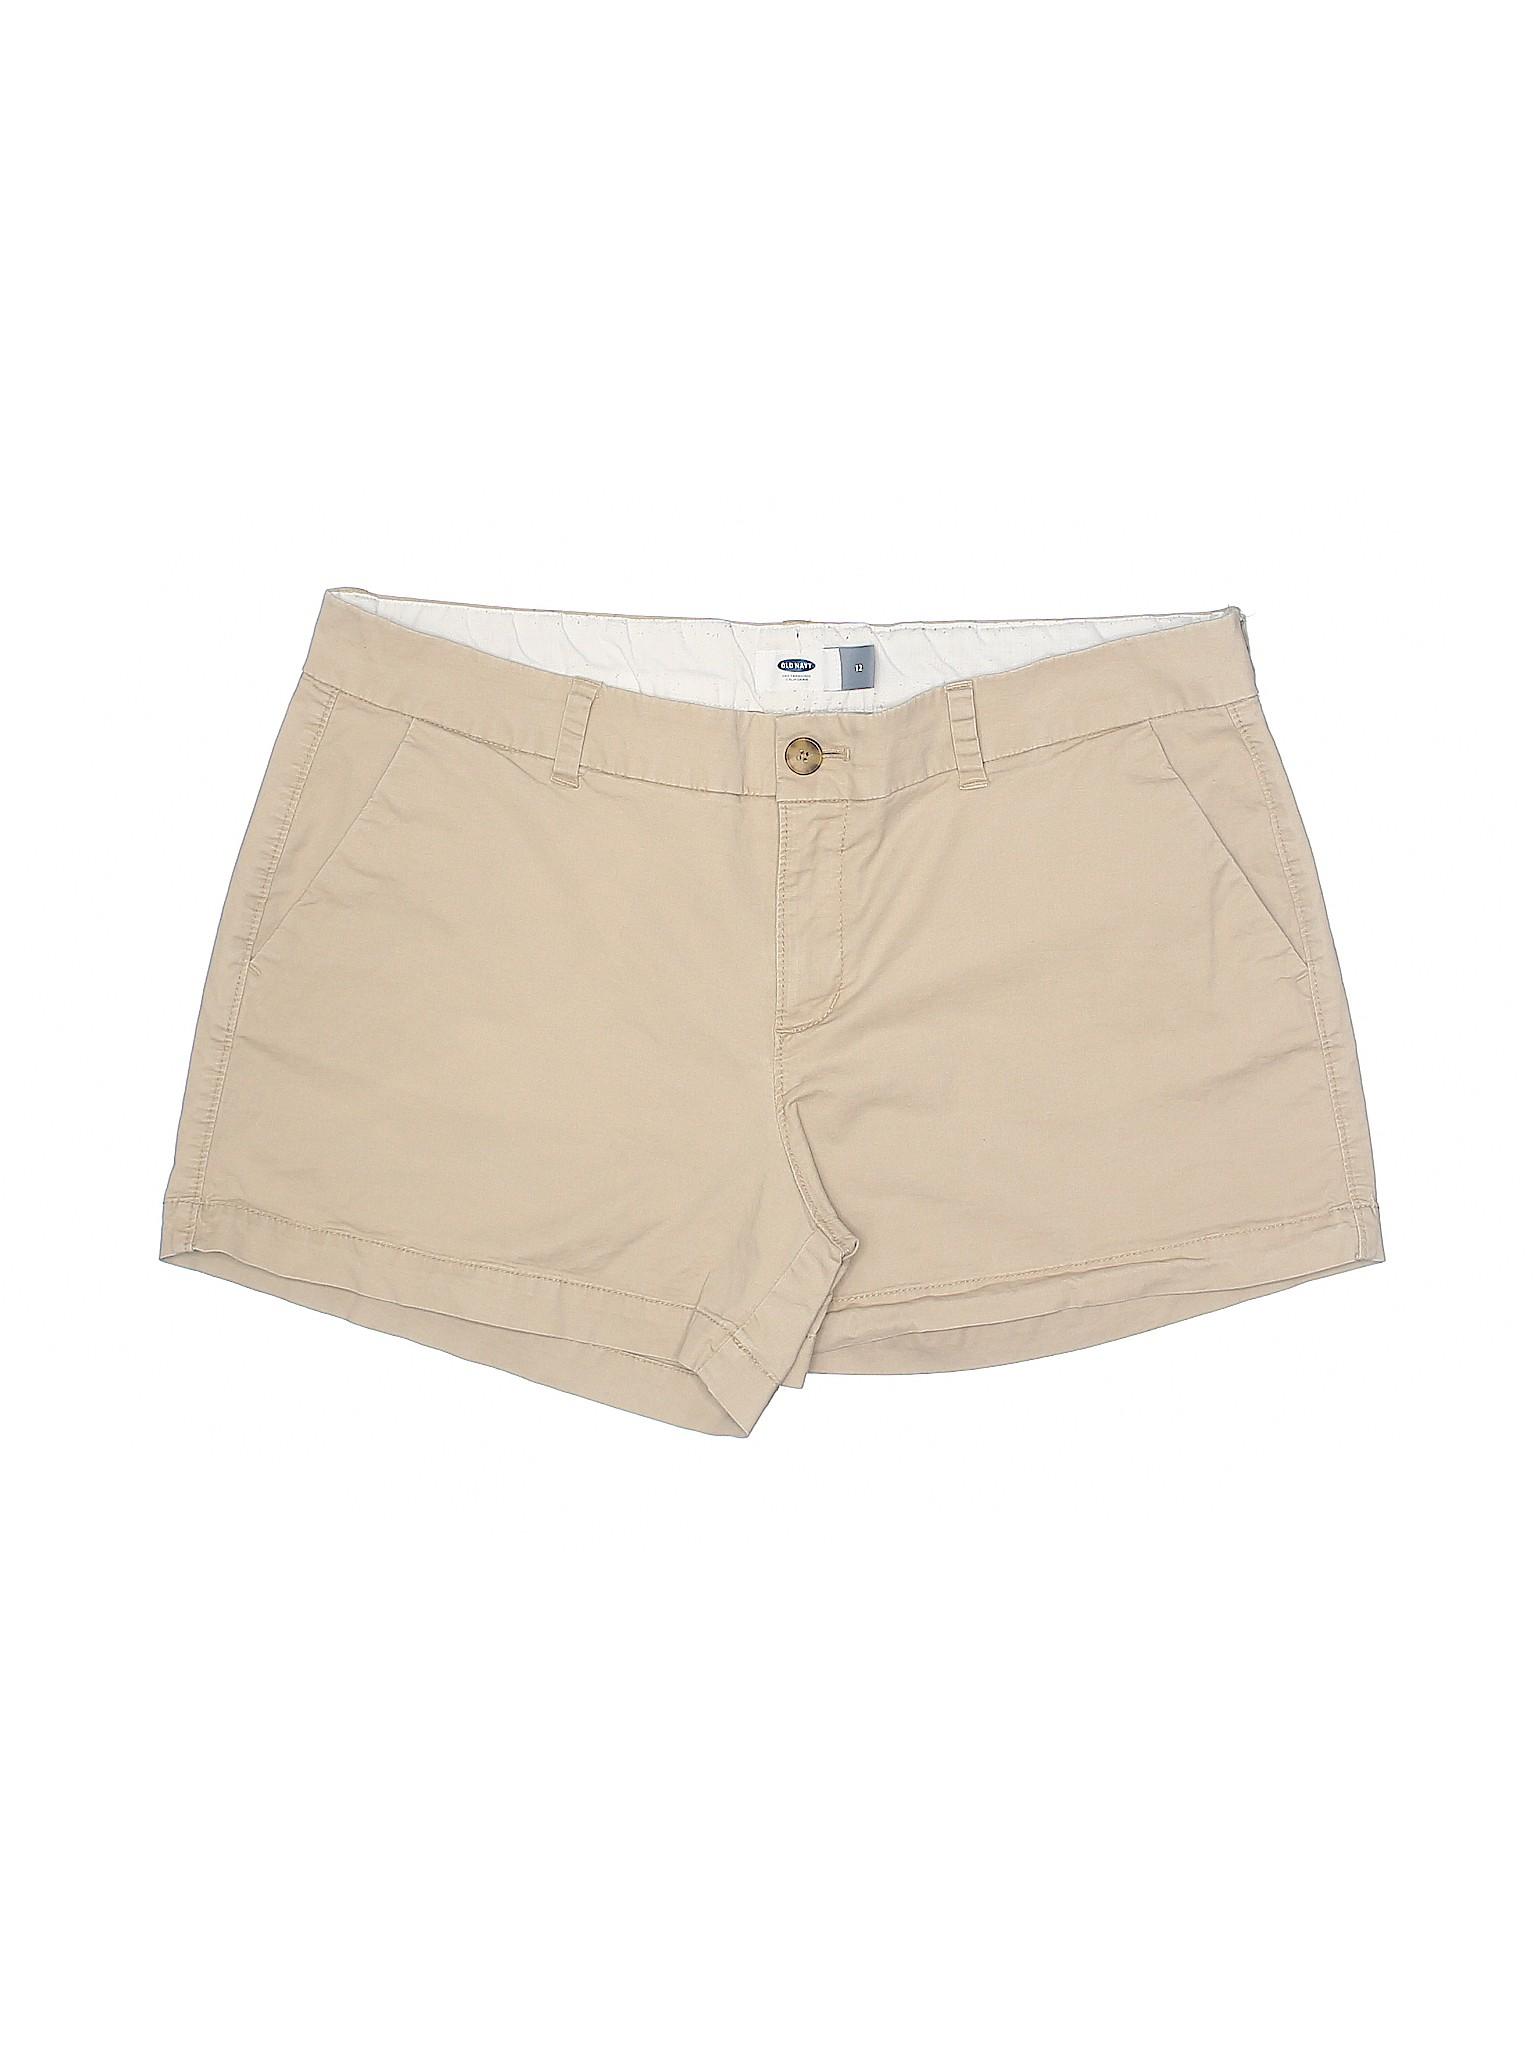 Navy Boutique Khaki Old winter Shorts Bqw0xzqR